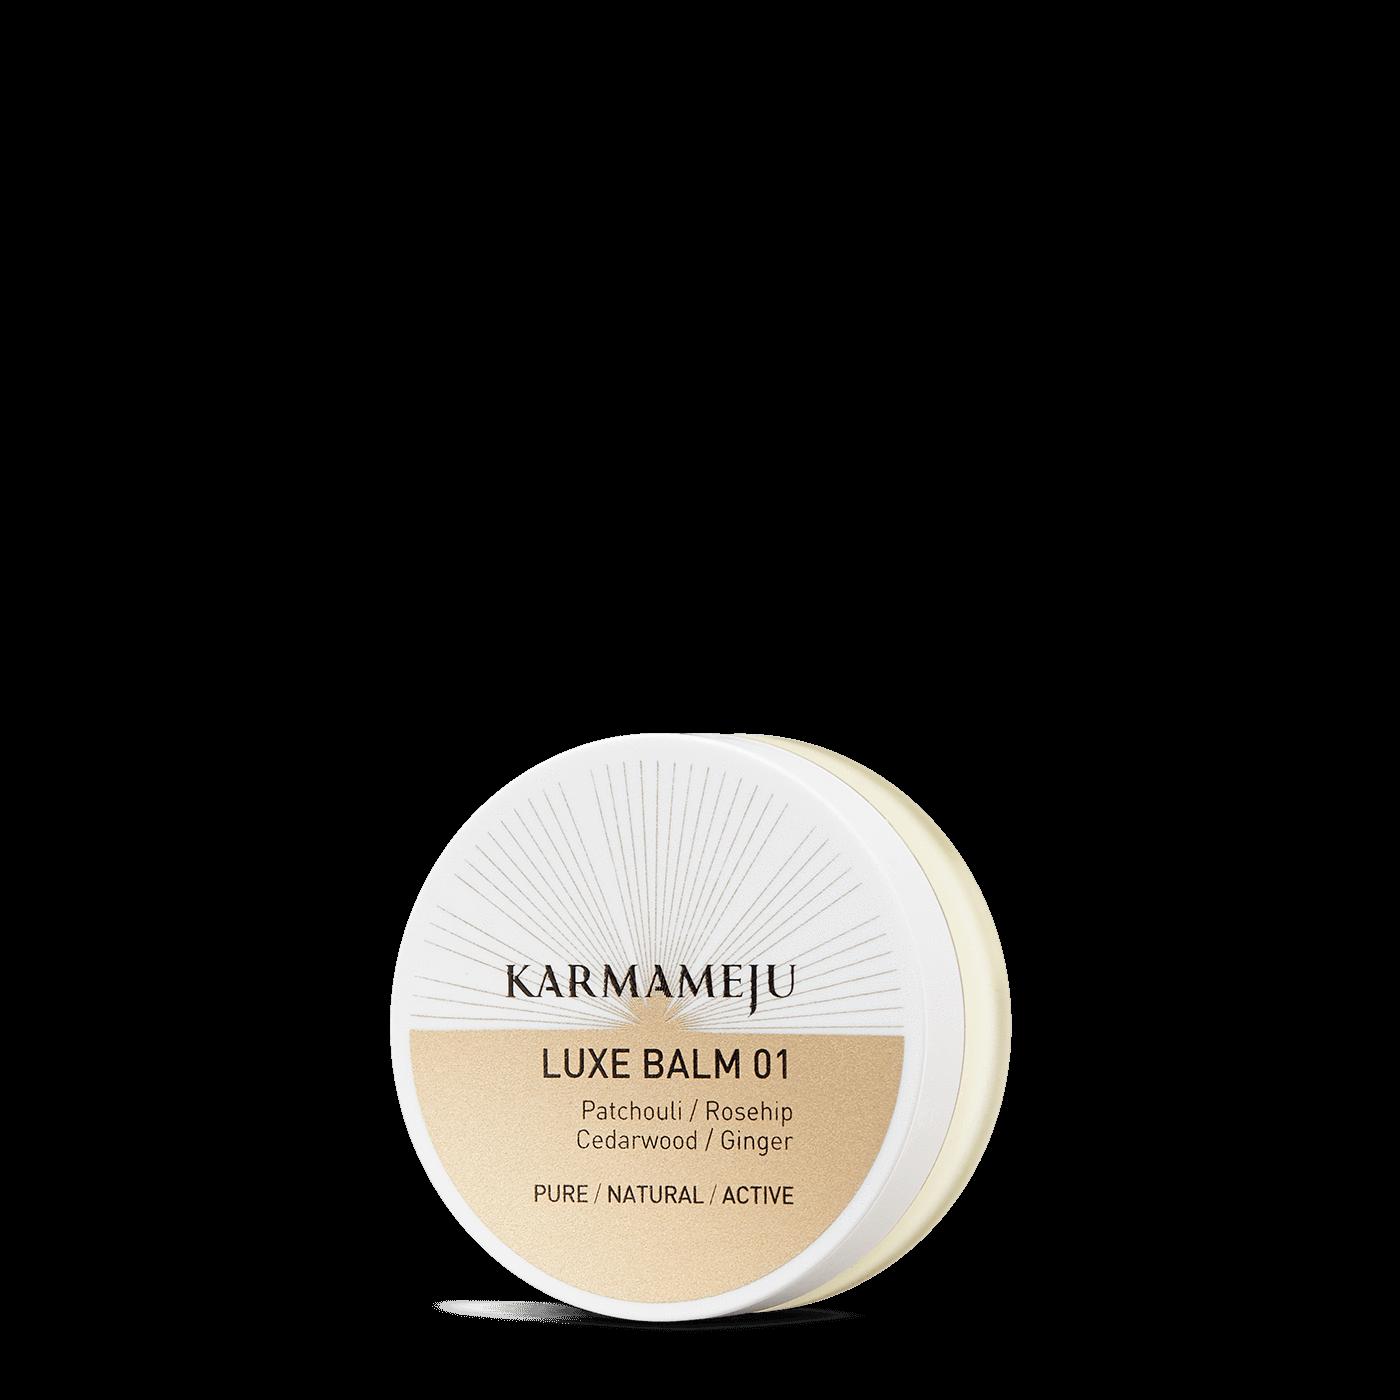 Karmameju LUXE / BALM 01 - Travel size